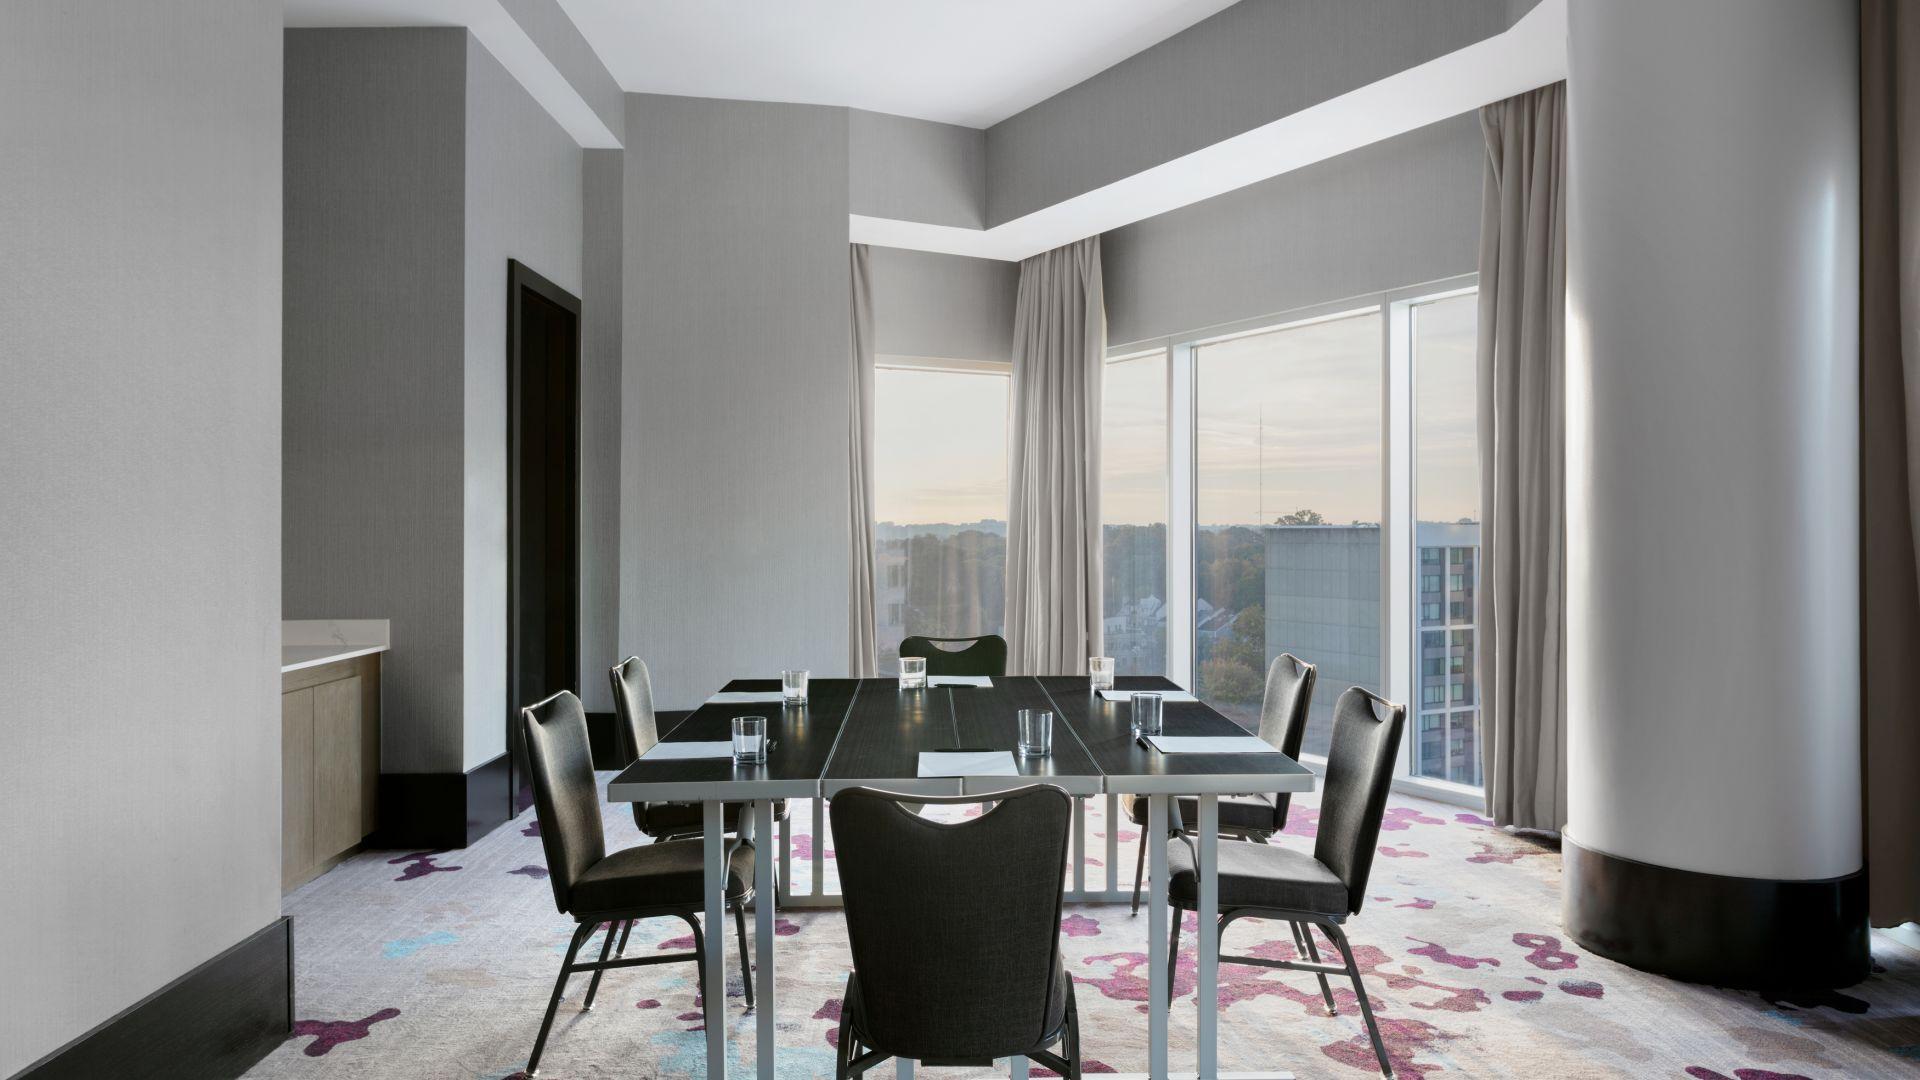 Candler meeting room